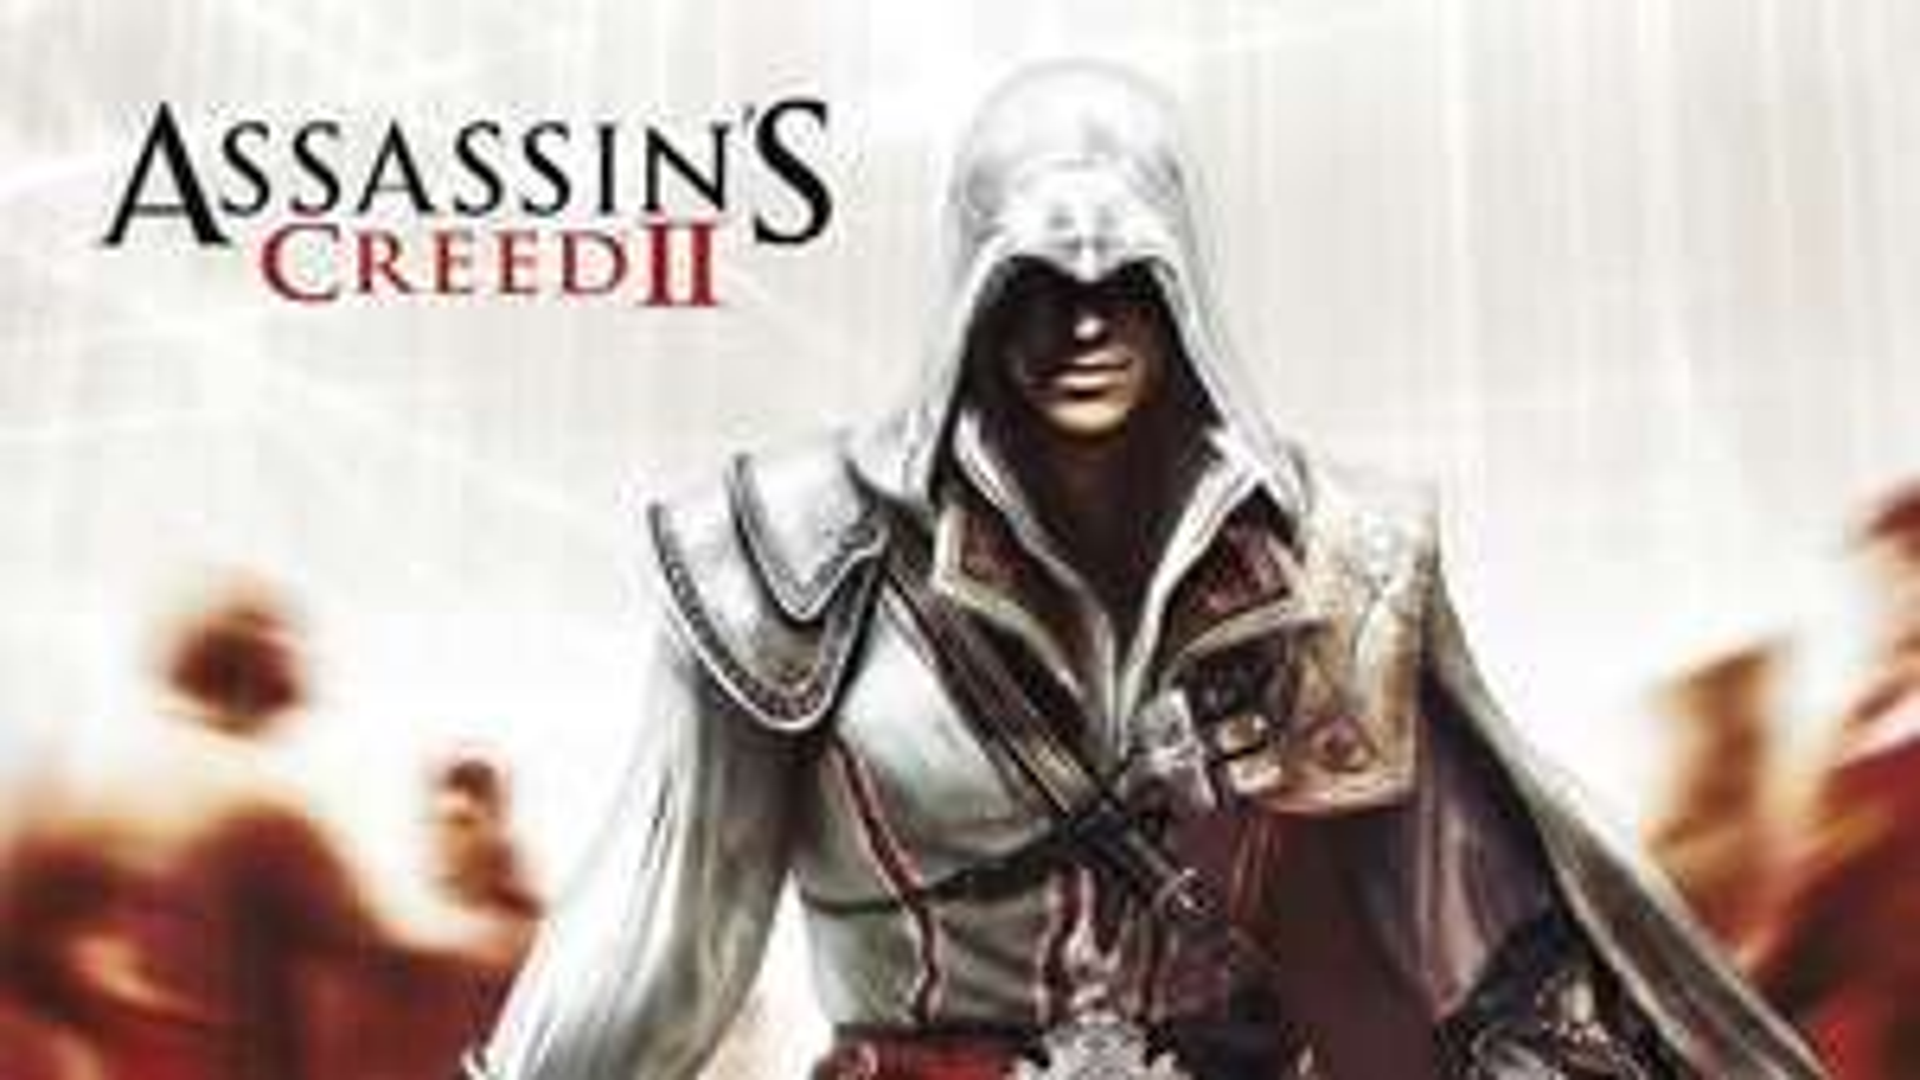 Assassin's Creed 2 uplay Freebie